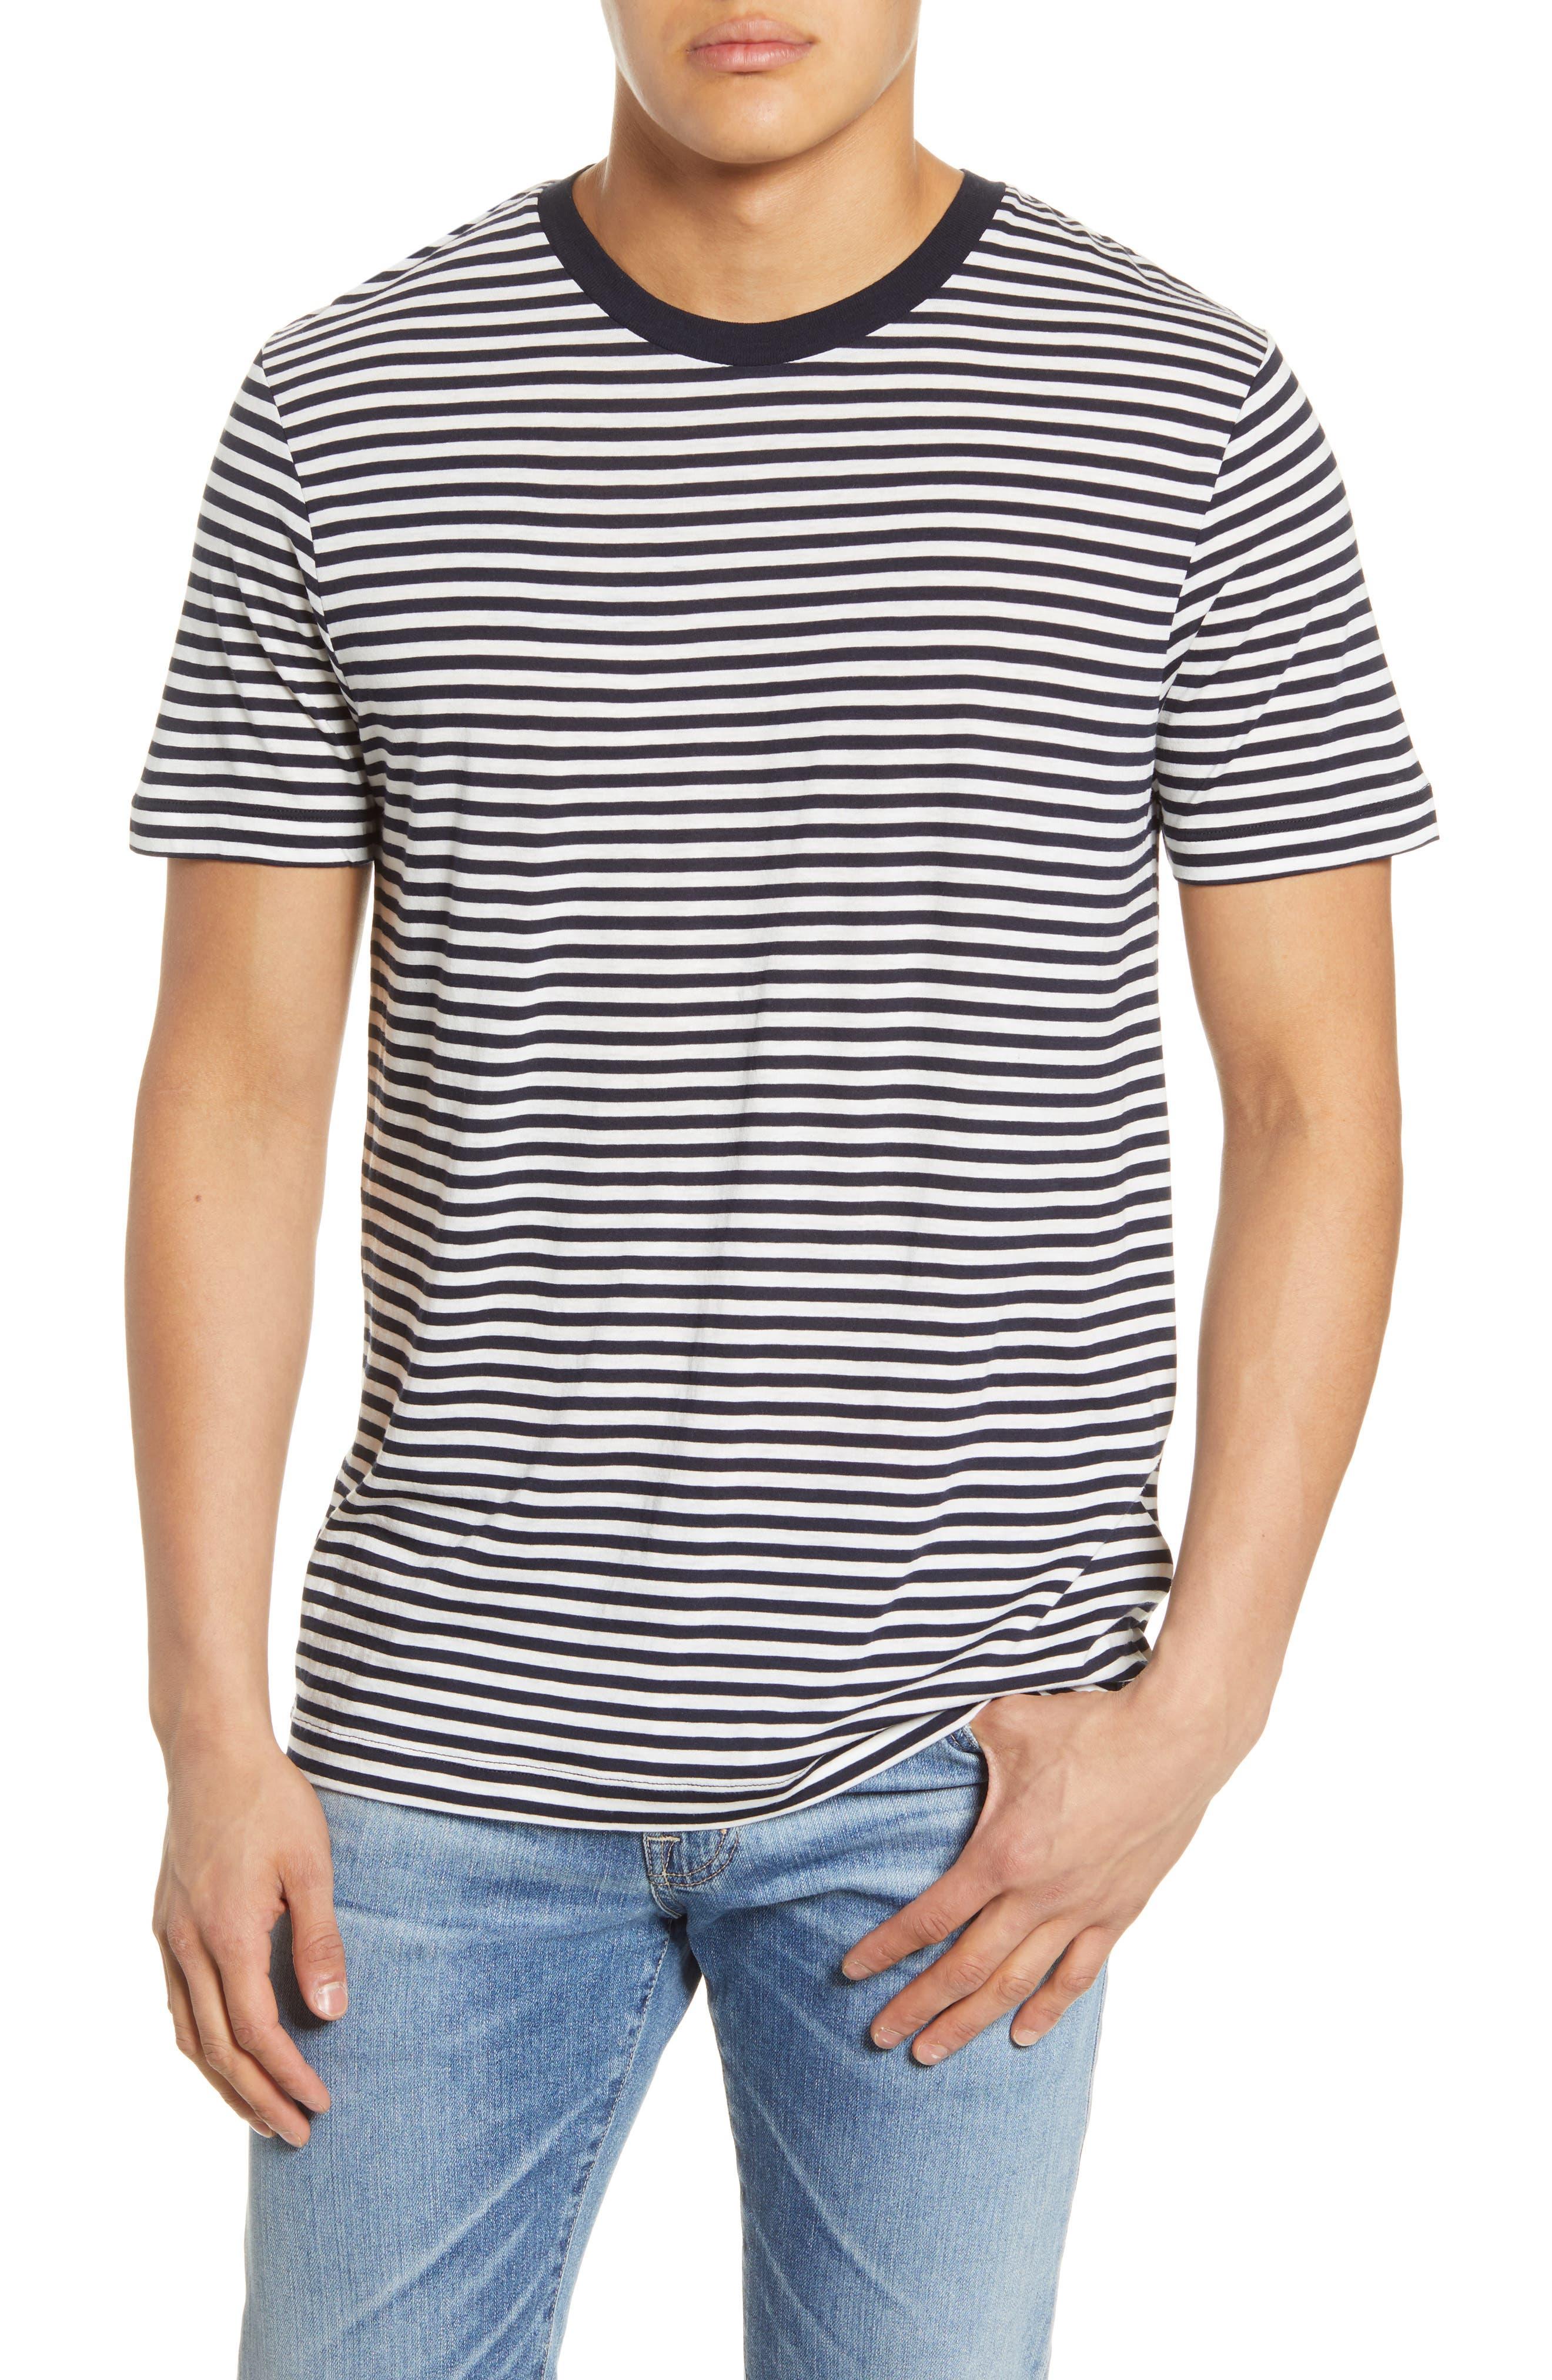 Mens Vintage Shirts – Retro Shirts Mens Scotch  Soda Stripe Slim Fit T-Shirt $32.50 AT vintagedancer.com